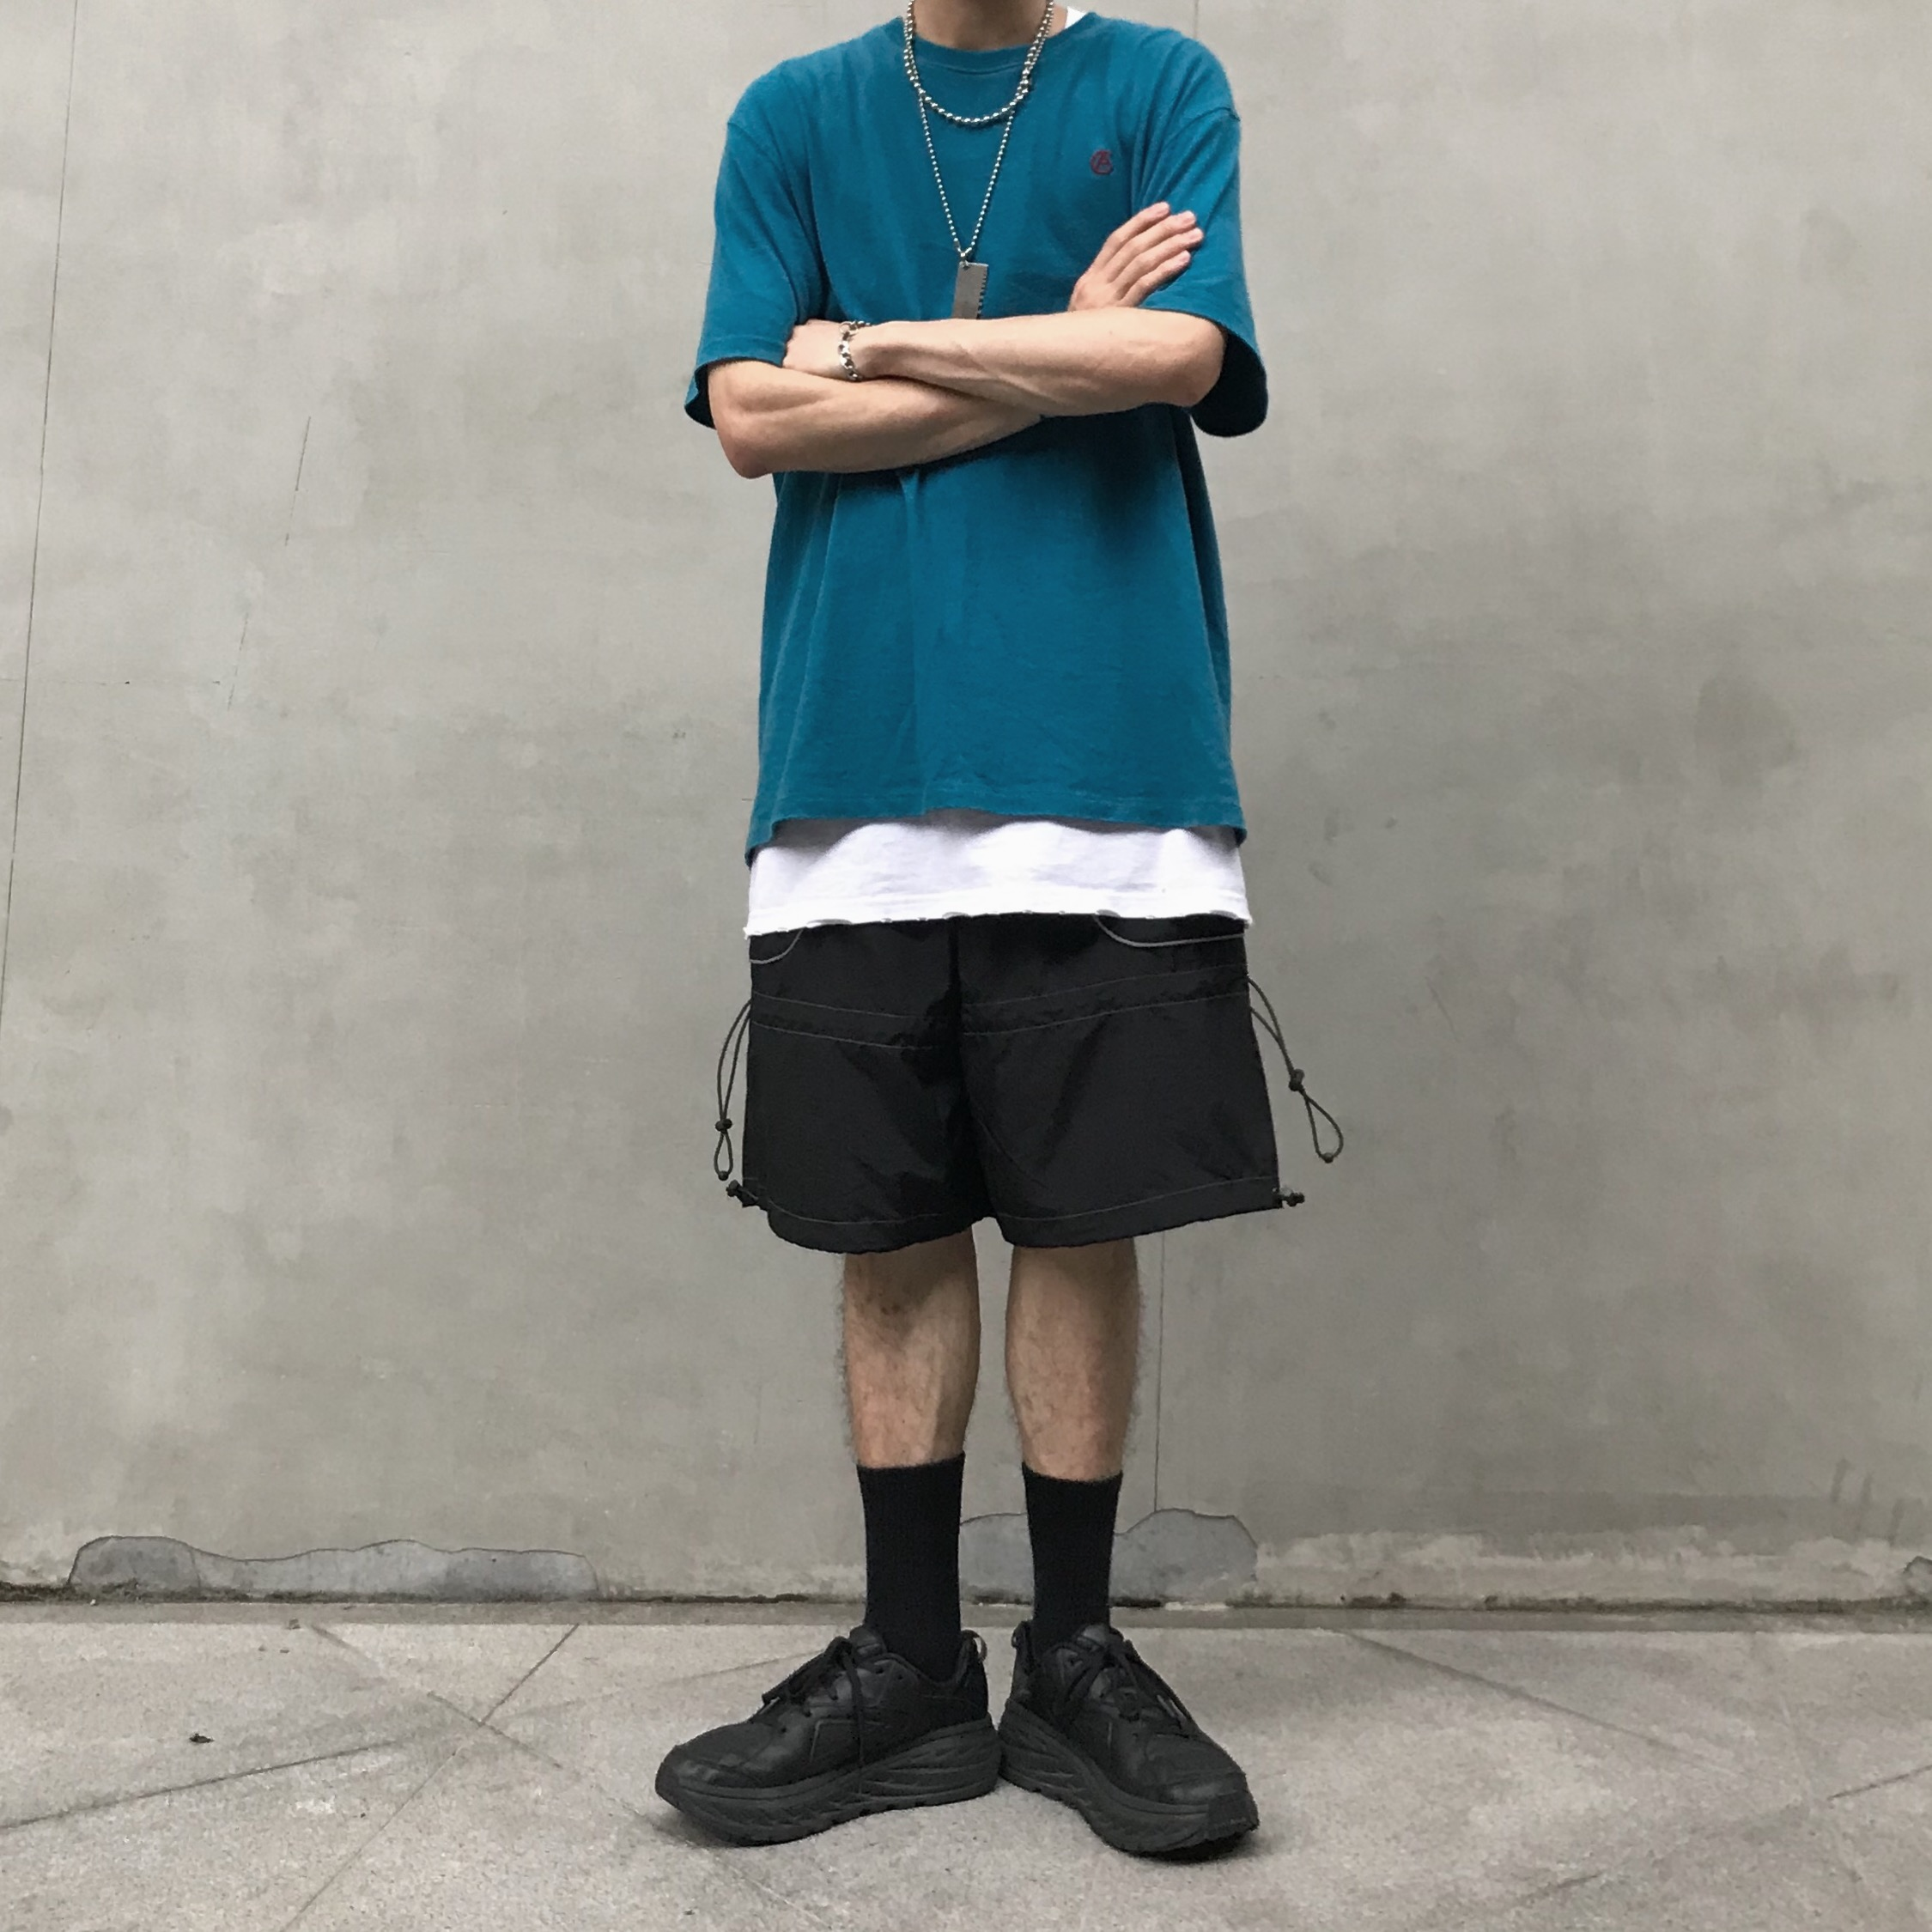 [cliche] fashionable elastic drawstring reflective logo casual versatile functional shorts for men and women